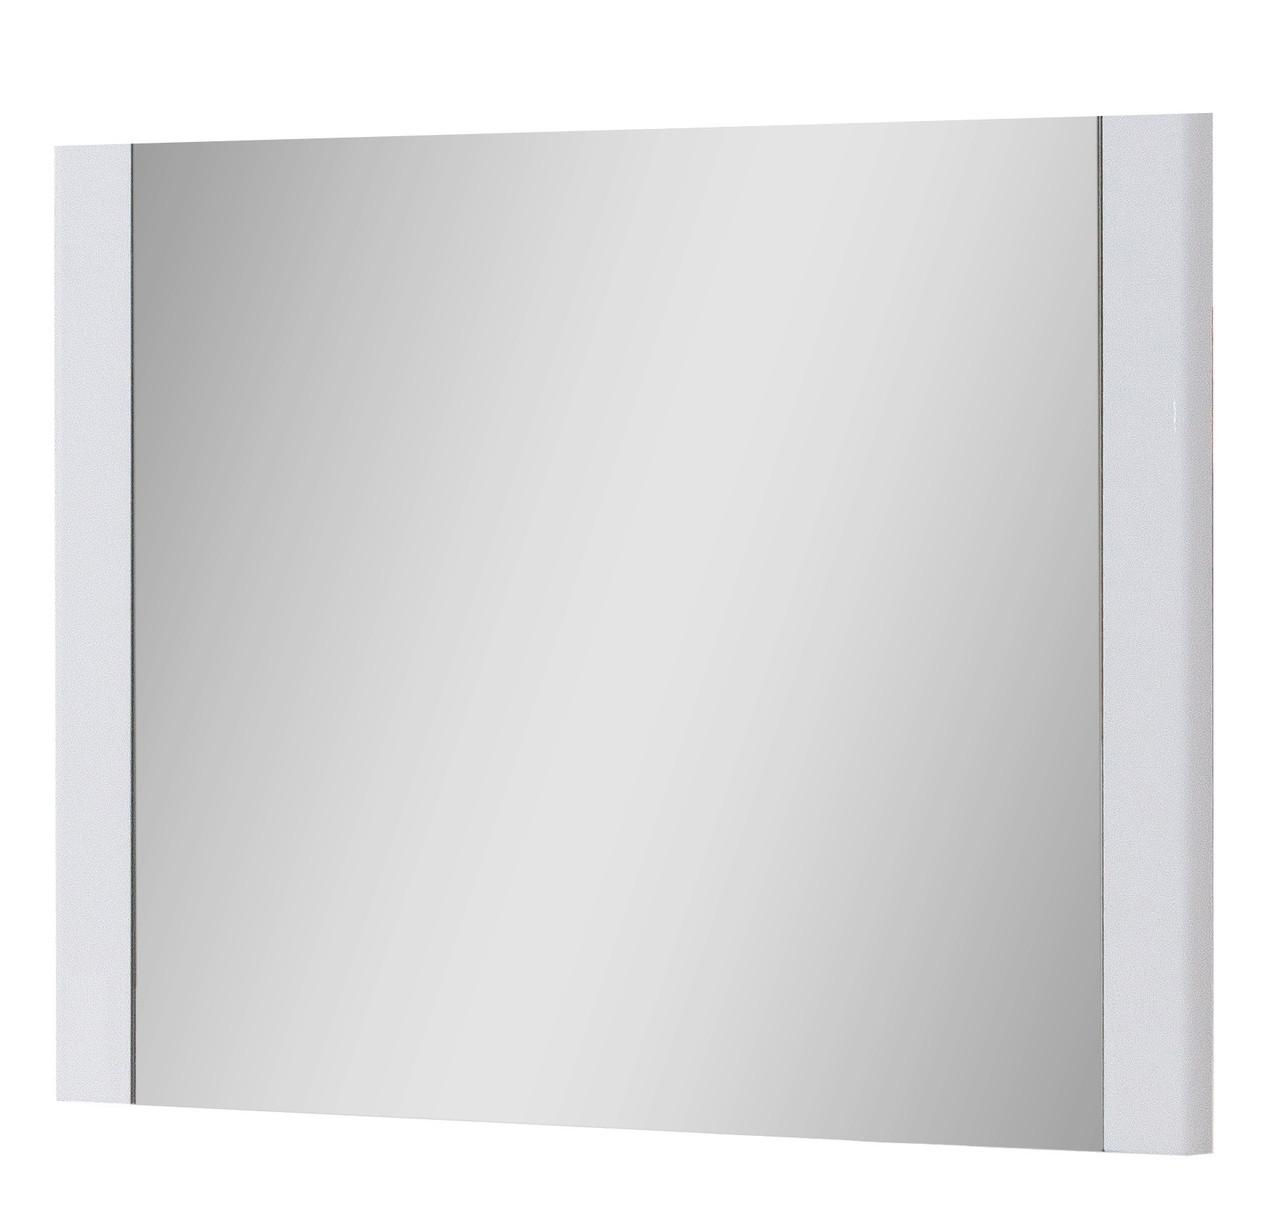 Зеркало для ванной комнаты Z-Эльба 80 (без подсветки) Юввис